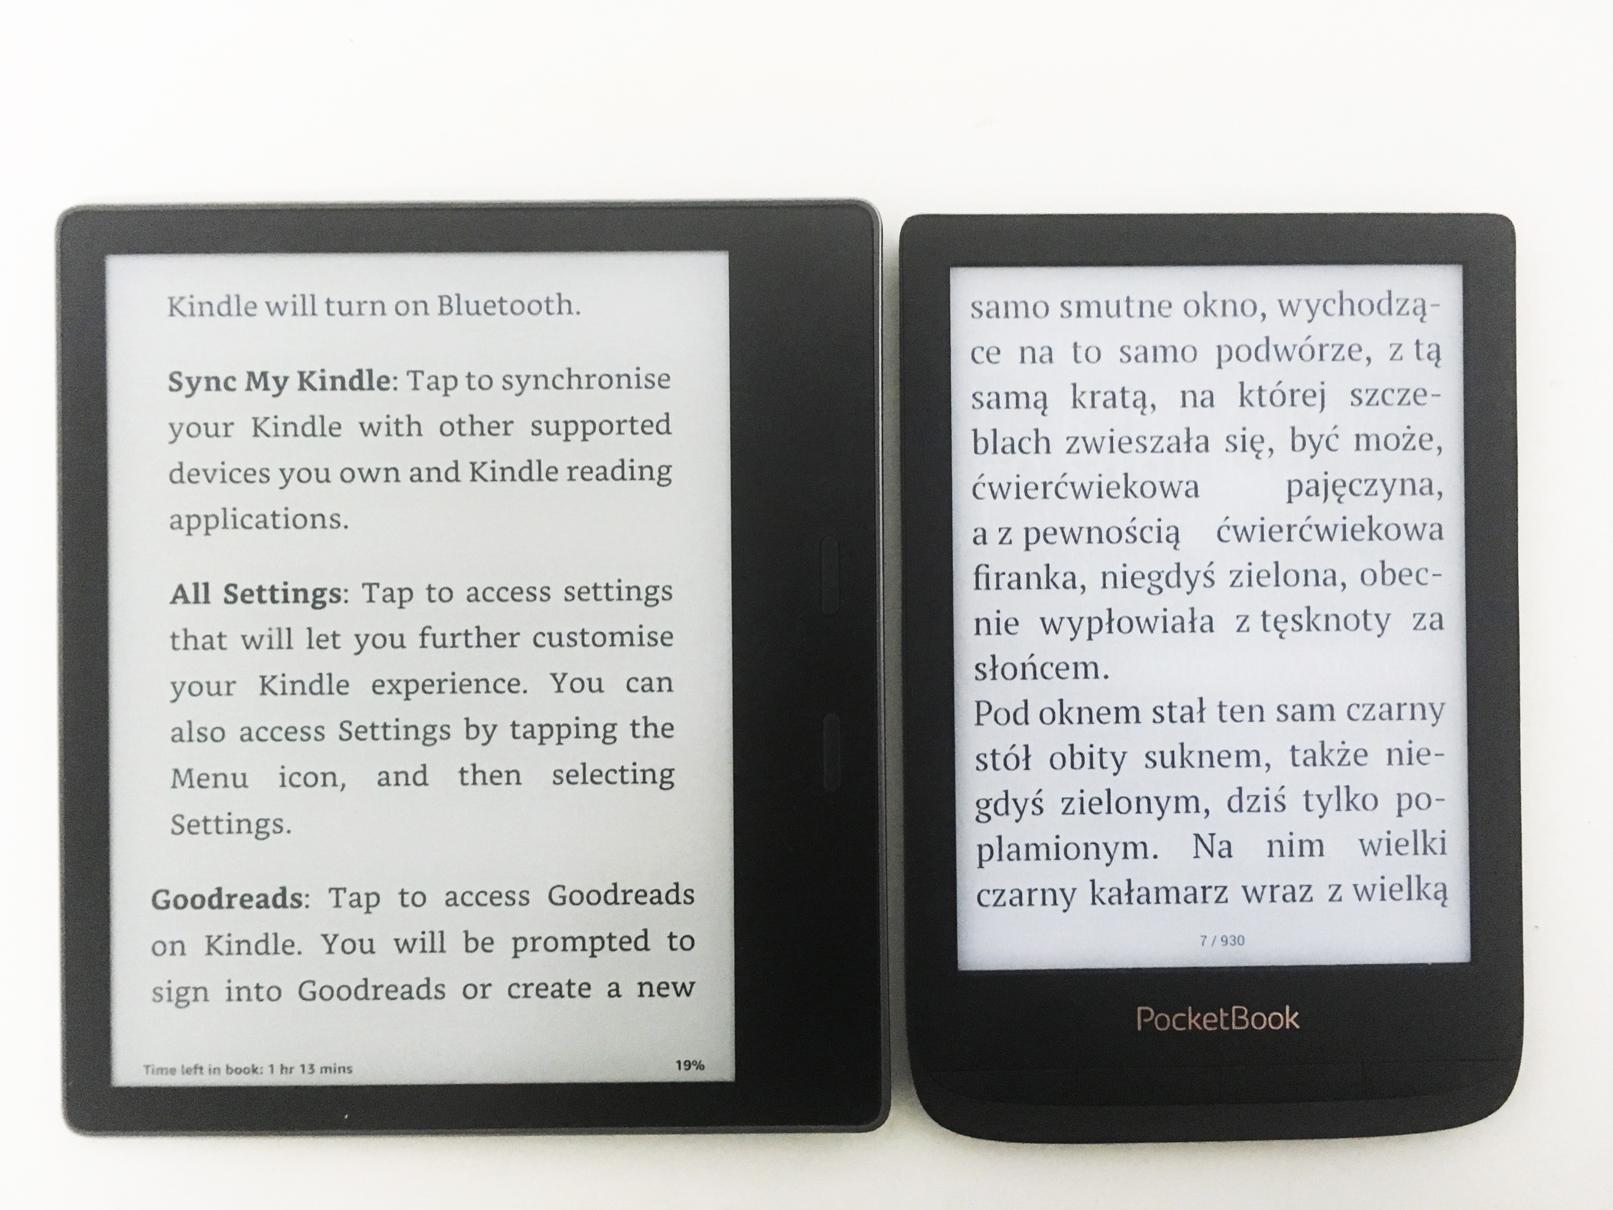 Kinlde oasis 2 pocketbook lux 4 czytanie